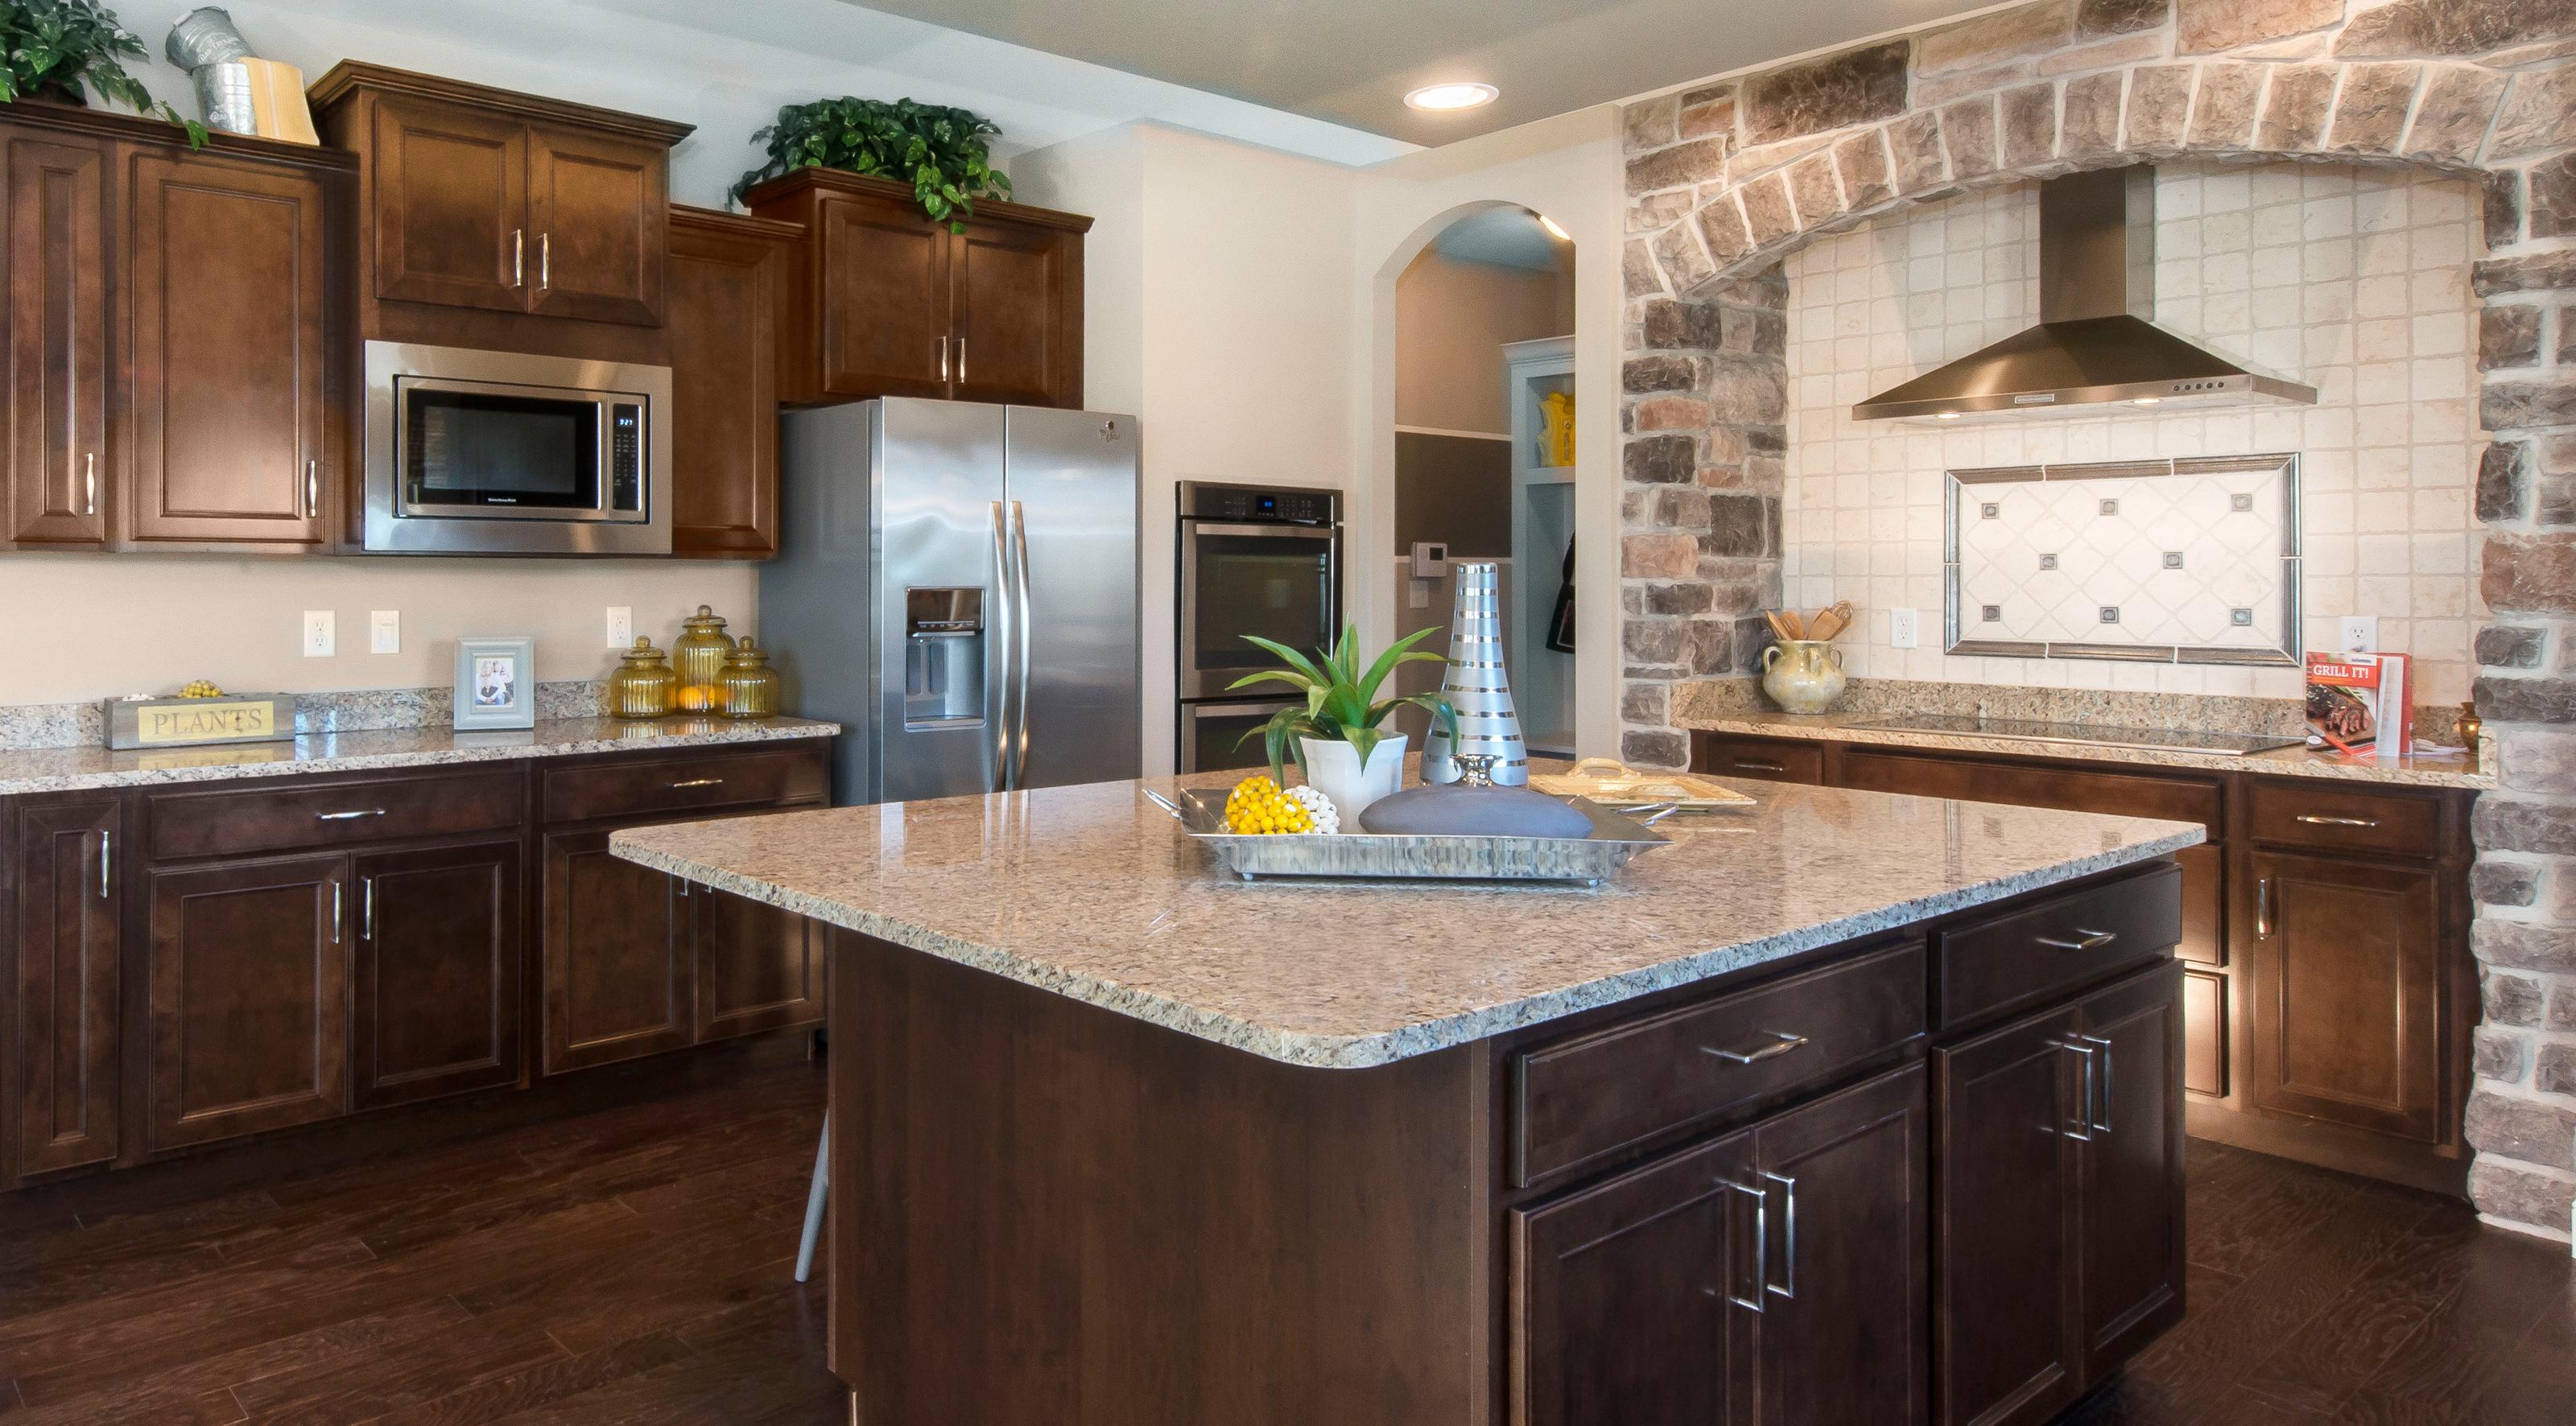 lombard-large-kitchen02.